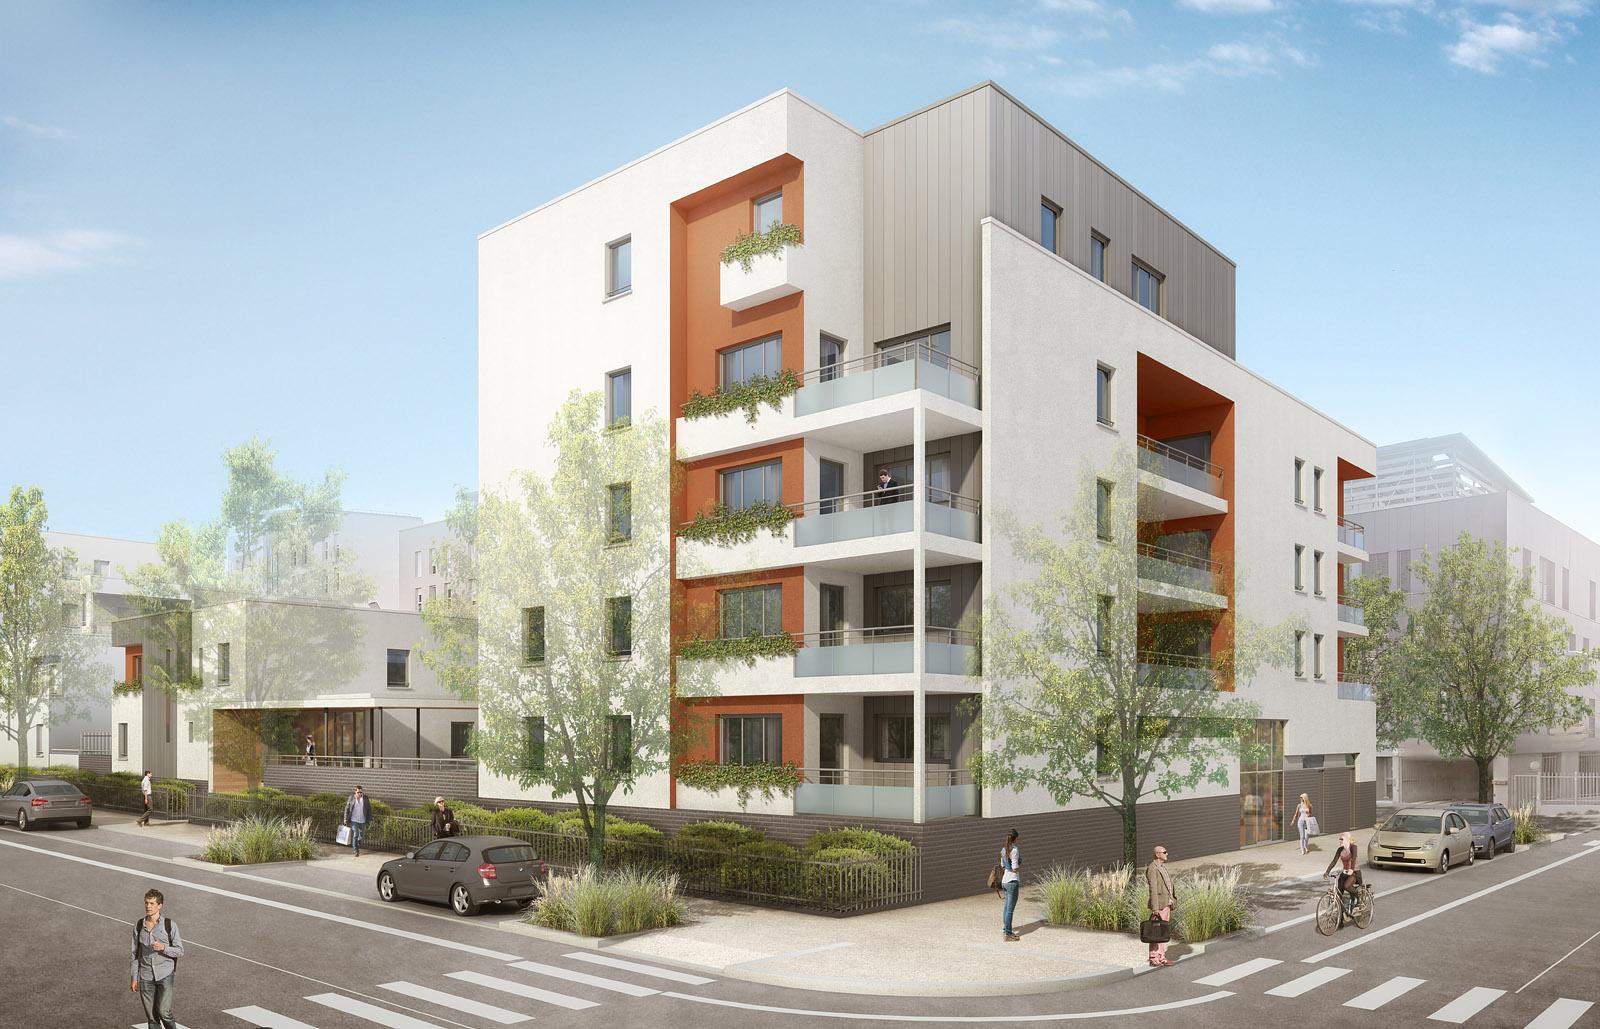 Projet de logements îlot D